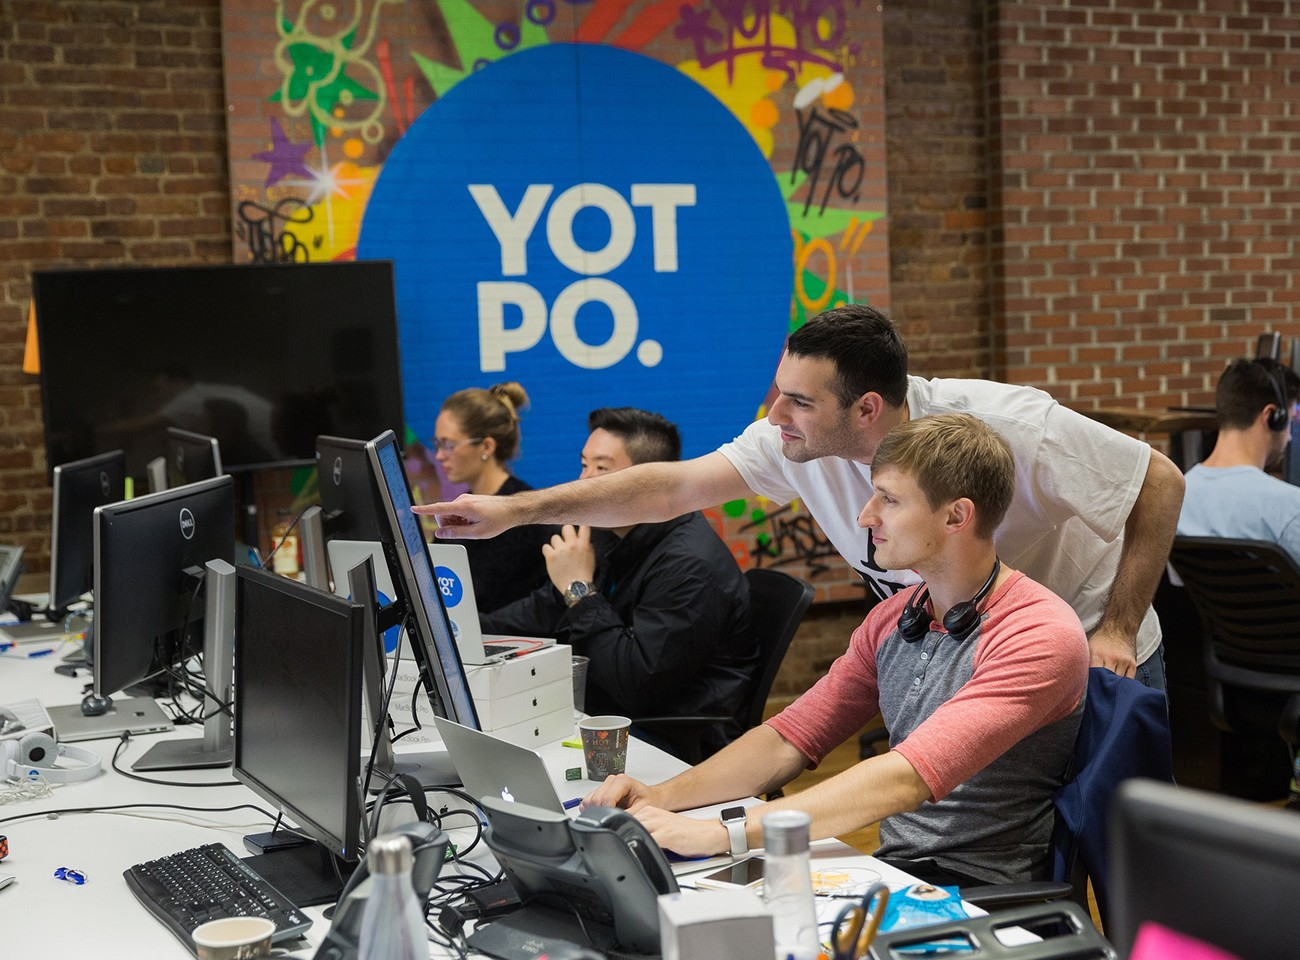 Yotpo Careers